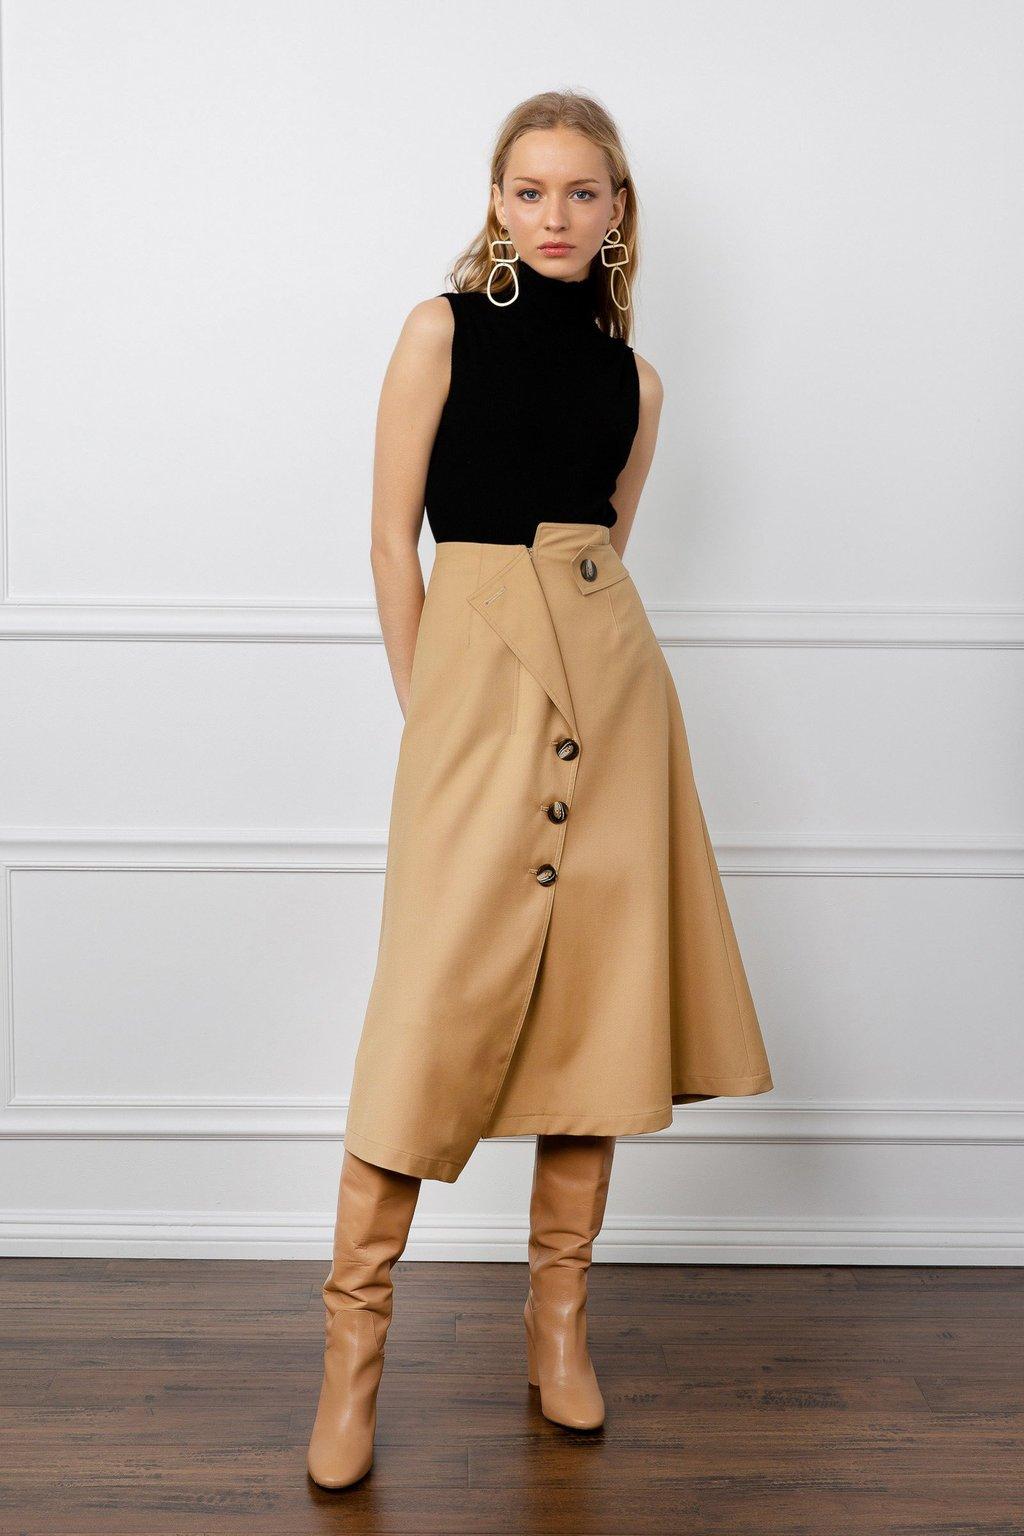 Honey Skirt by J.ING women's fashion clothing